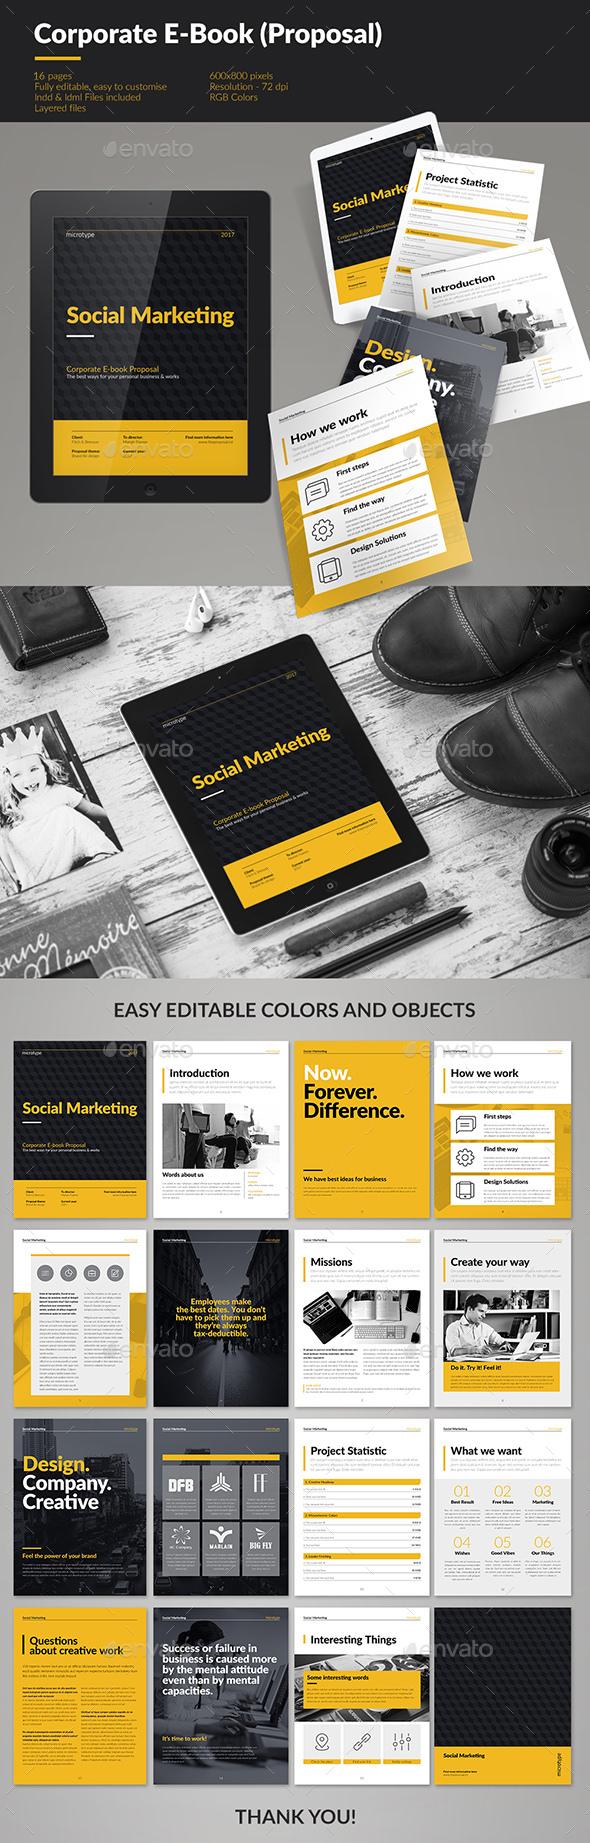 Corporate E-book Template - Digital Magazines ePublishing